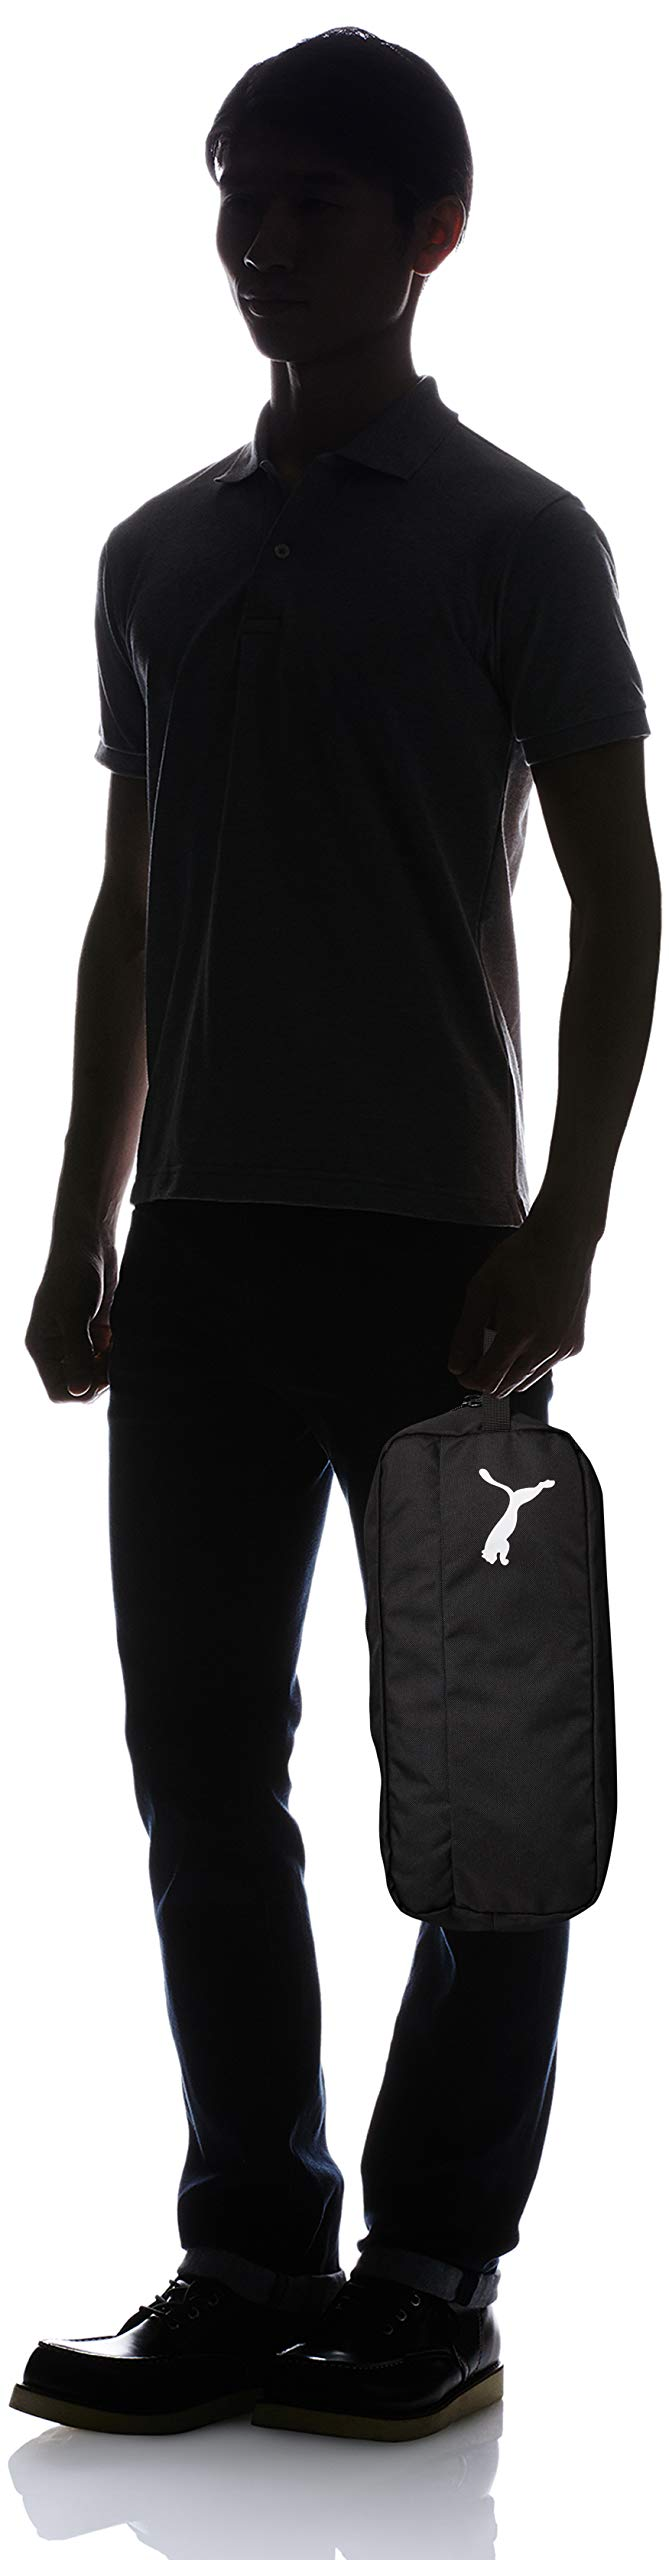 PUMA Team Goal 23 Sports Gym Football Rugby Shoe Bag